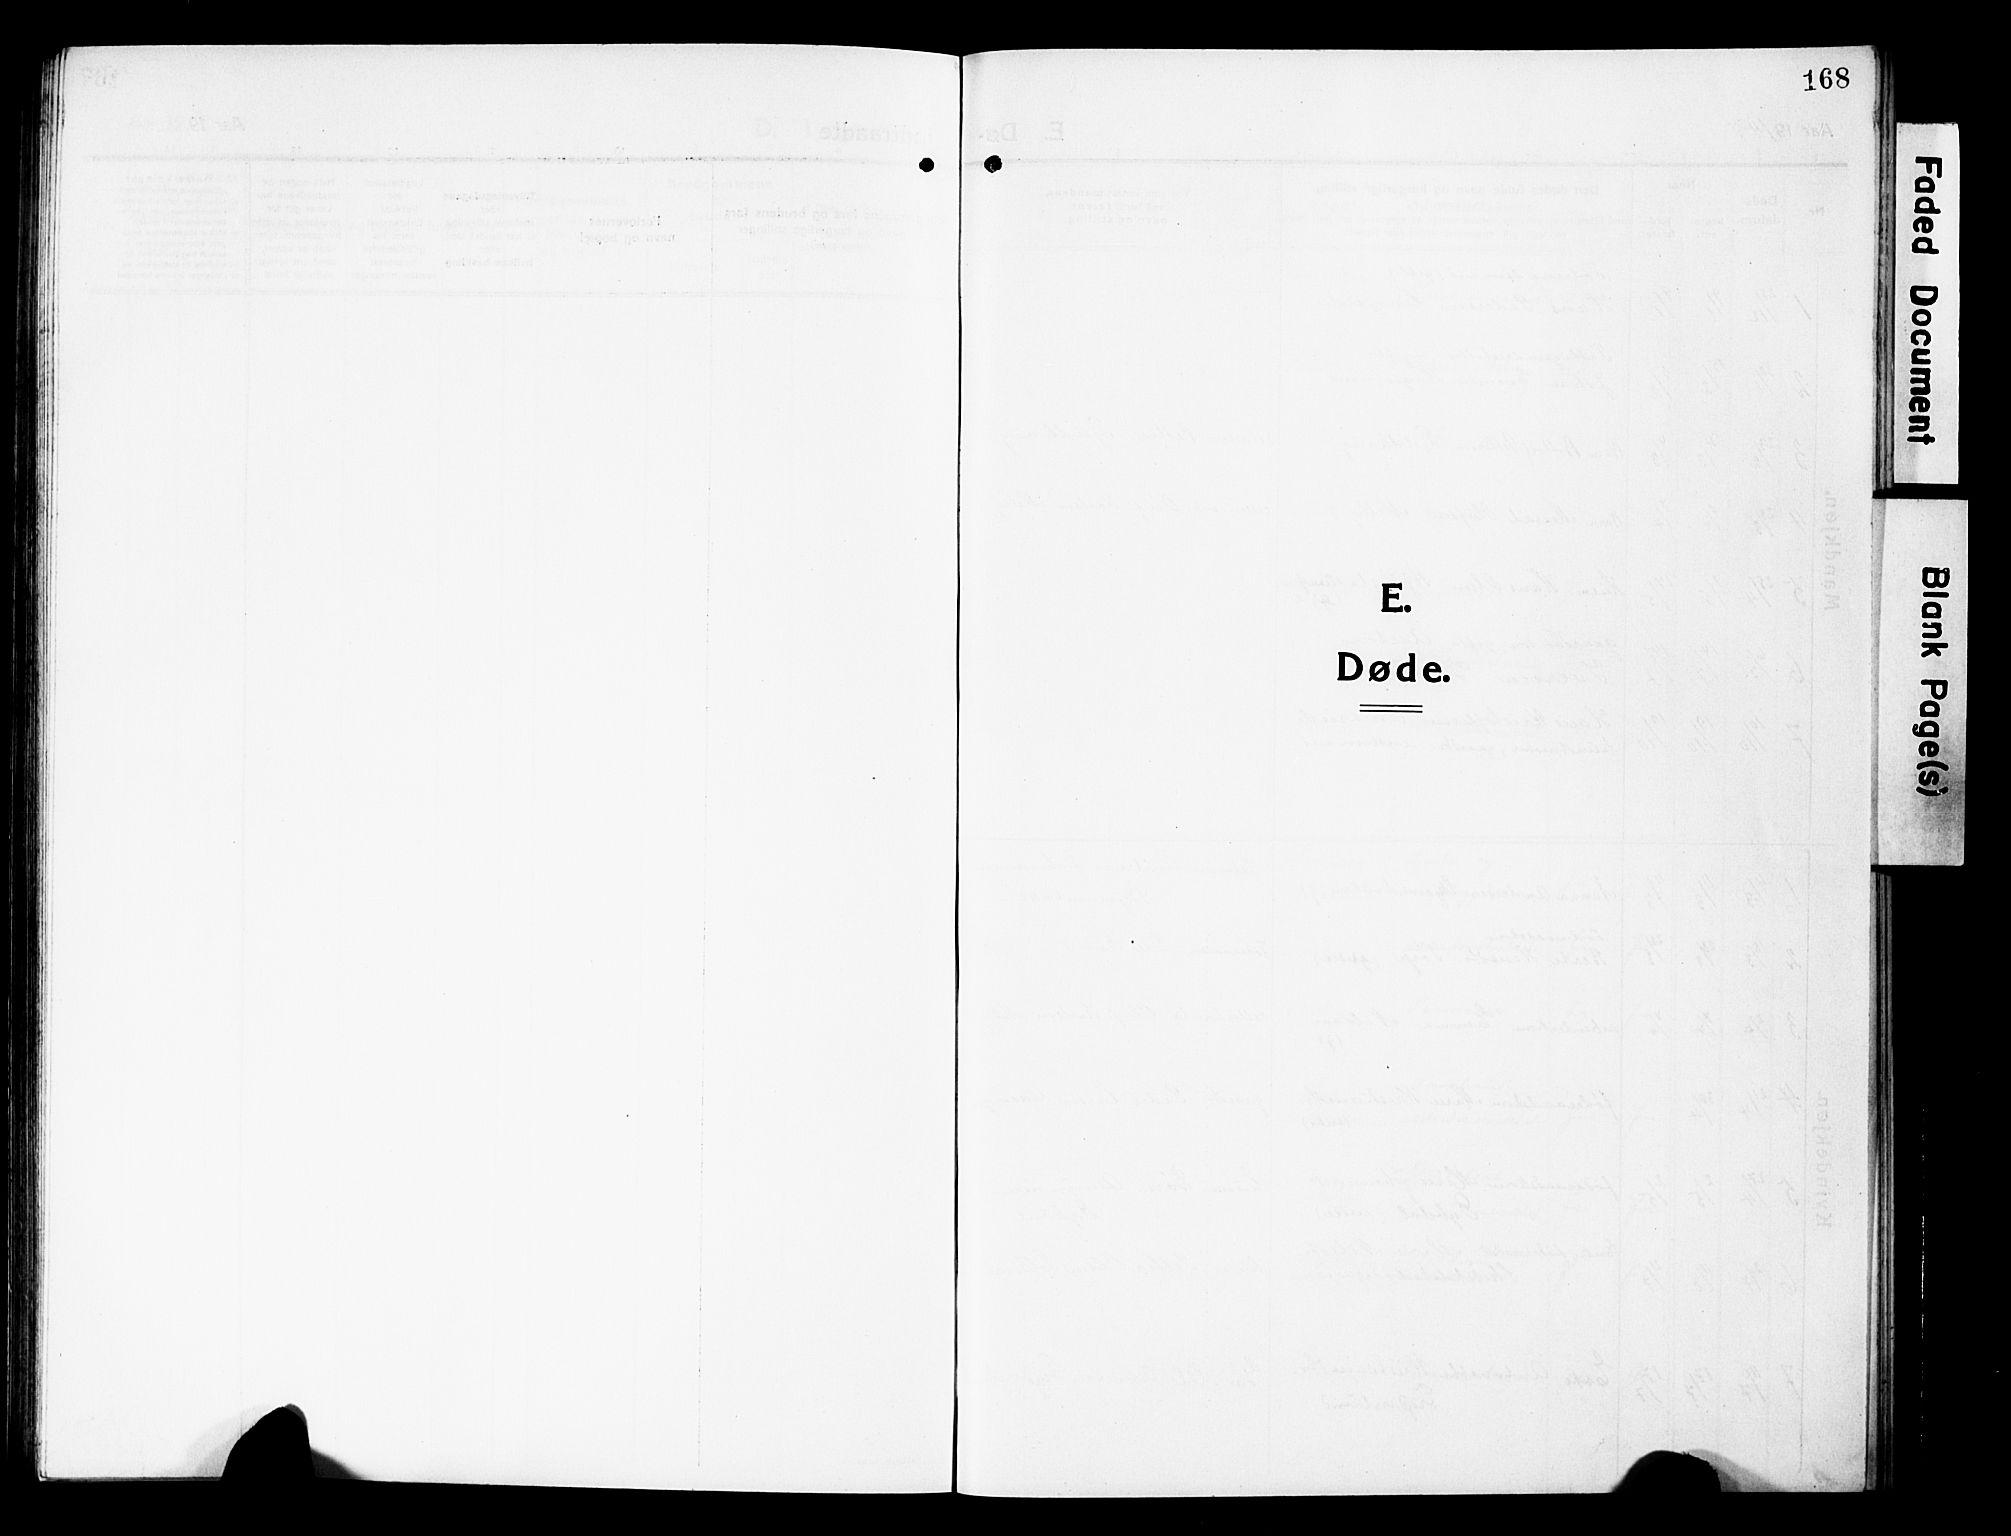 SAH, Vardal prestekontor, H/Ha/Hab/L0015: Klokkerbok nr. 15, 1914-1931, s. 168